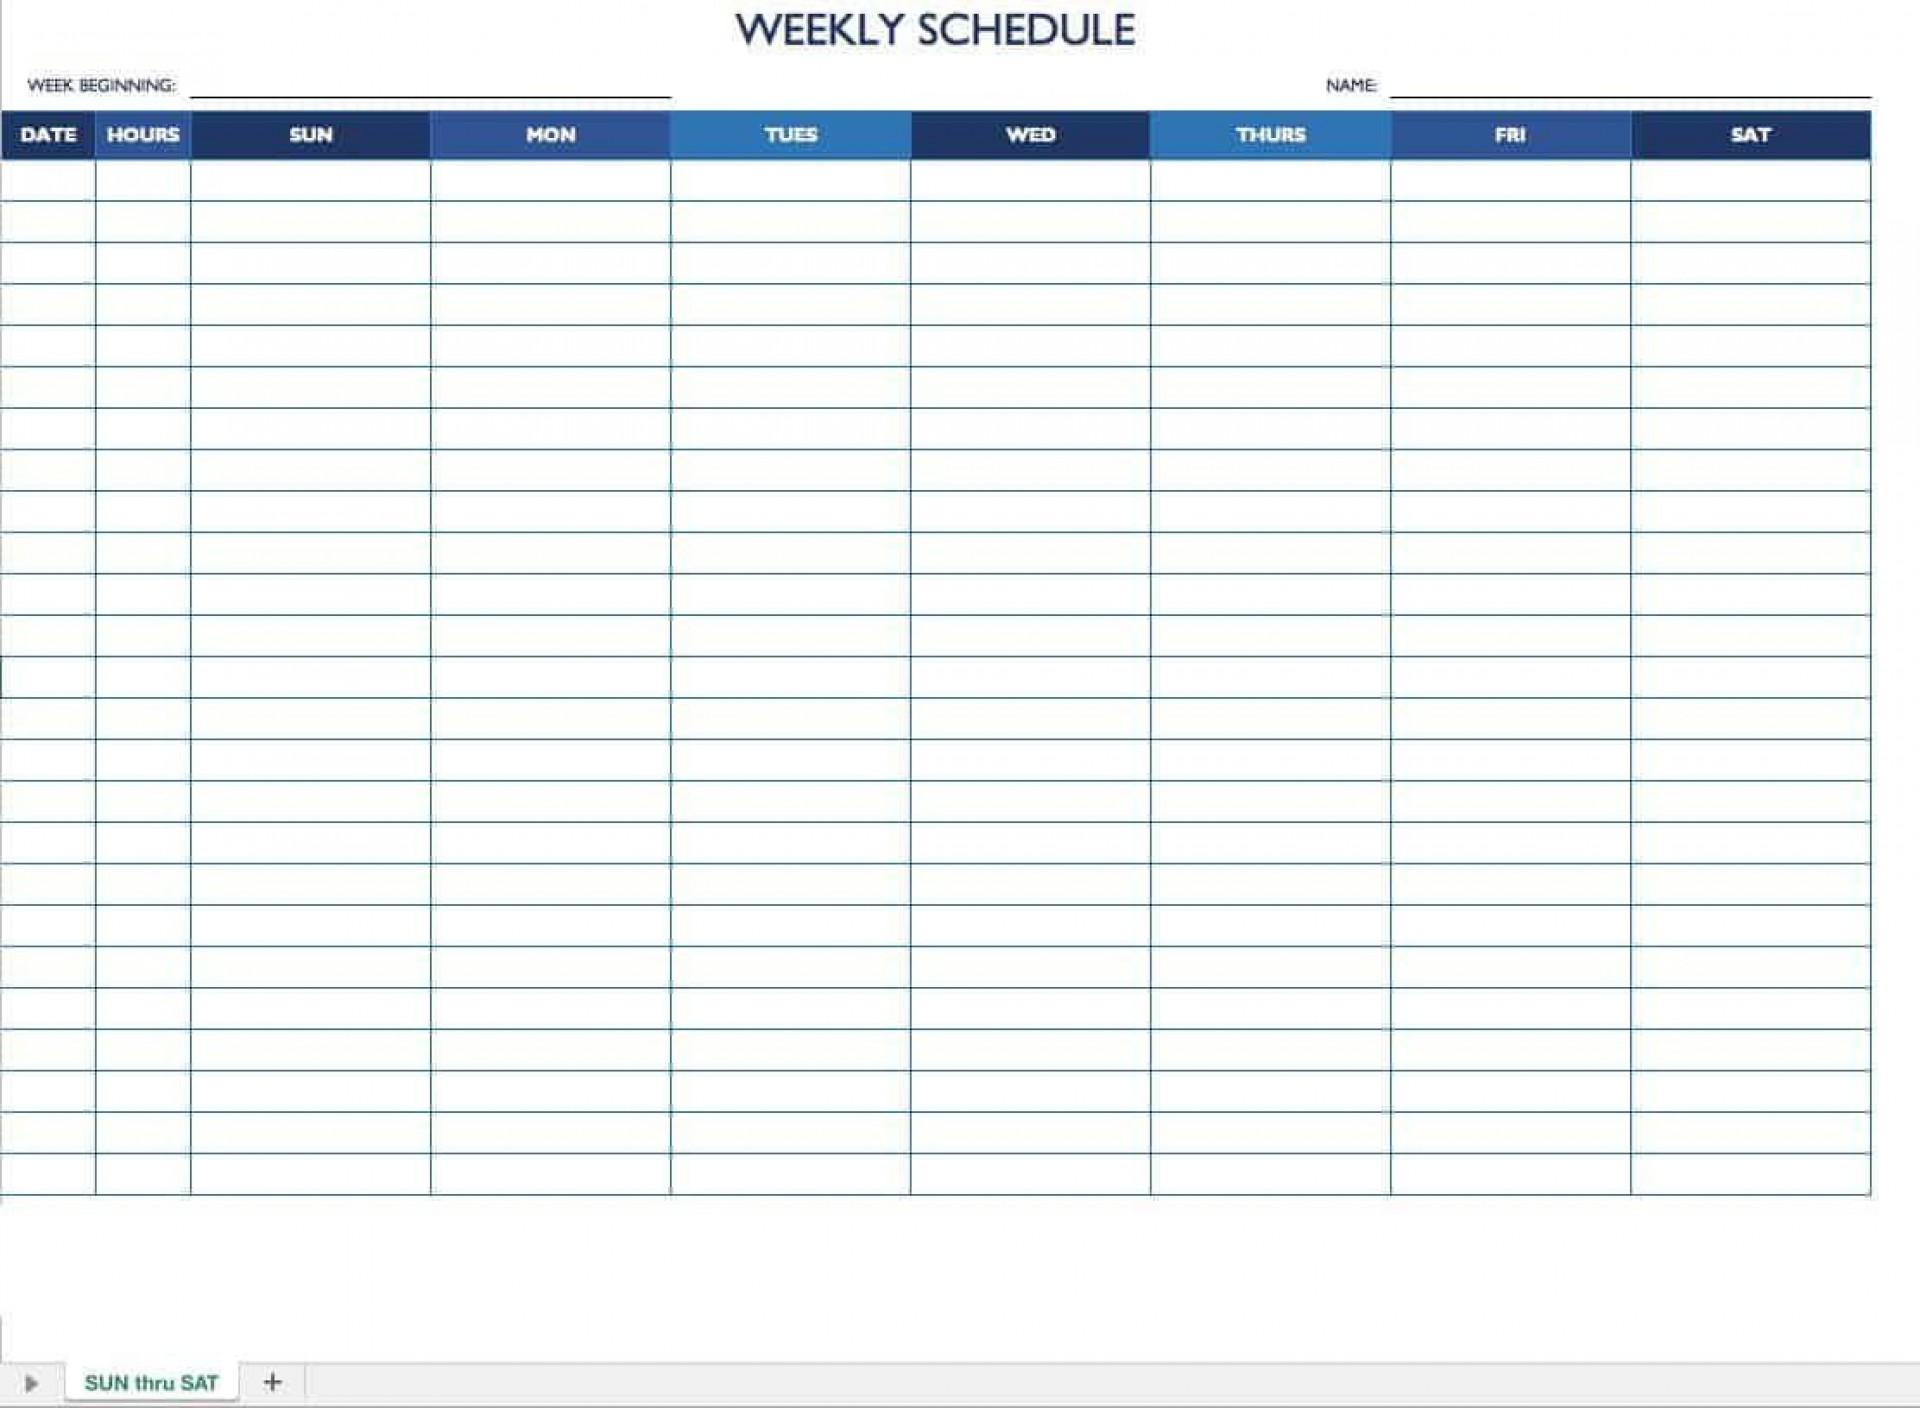 009 Impressive Free Work Schedule Template Excel High Resolution  Plan Monthly Employee1920